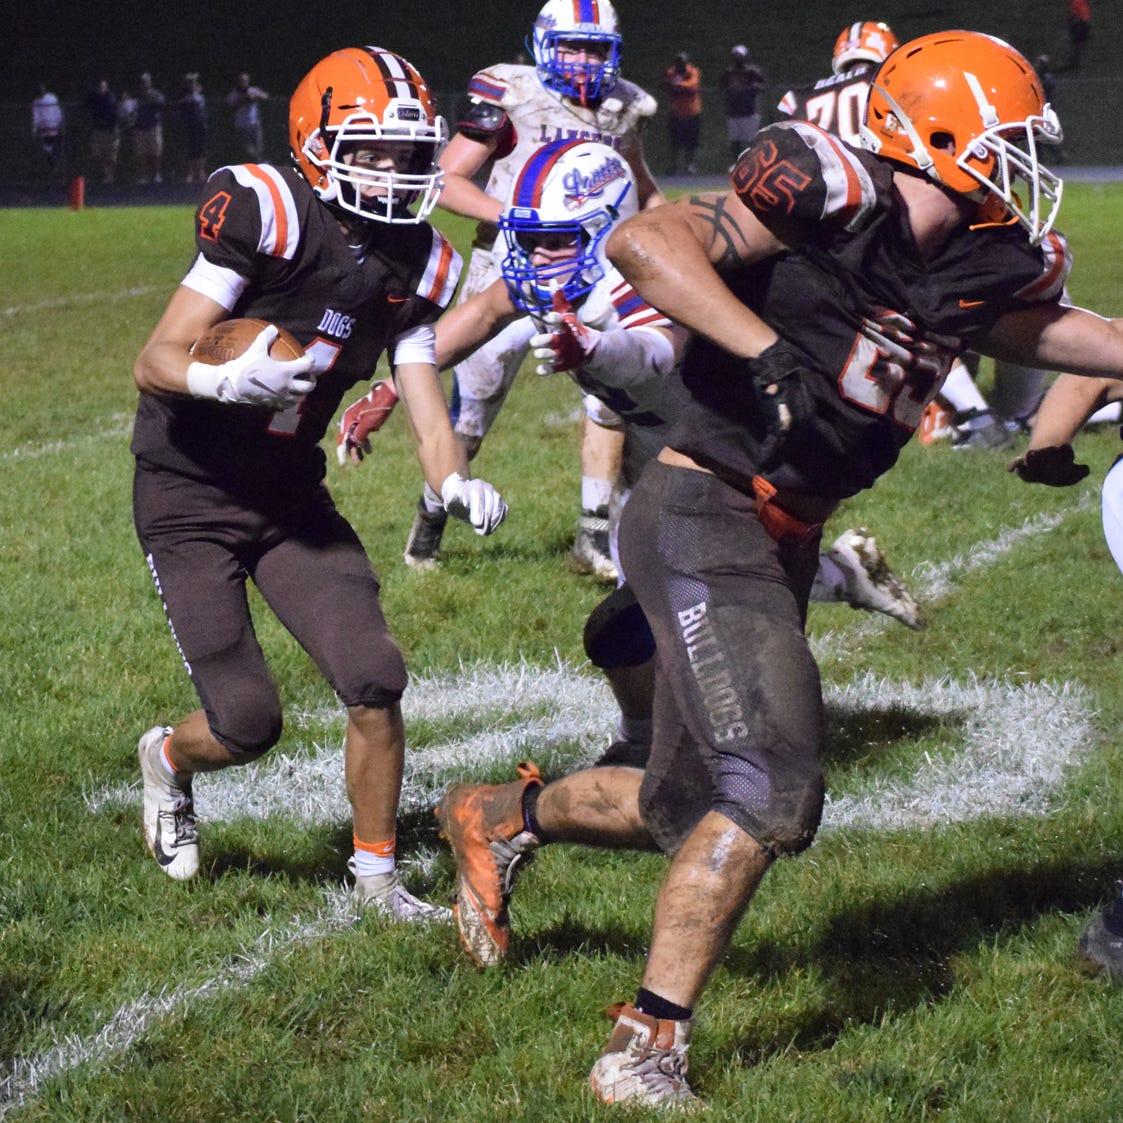 Big plays power Heath in shutout of Lakewood